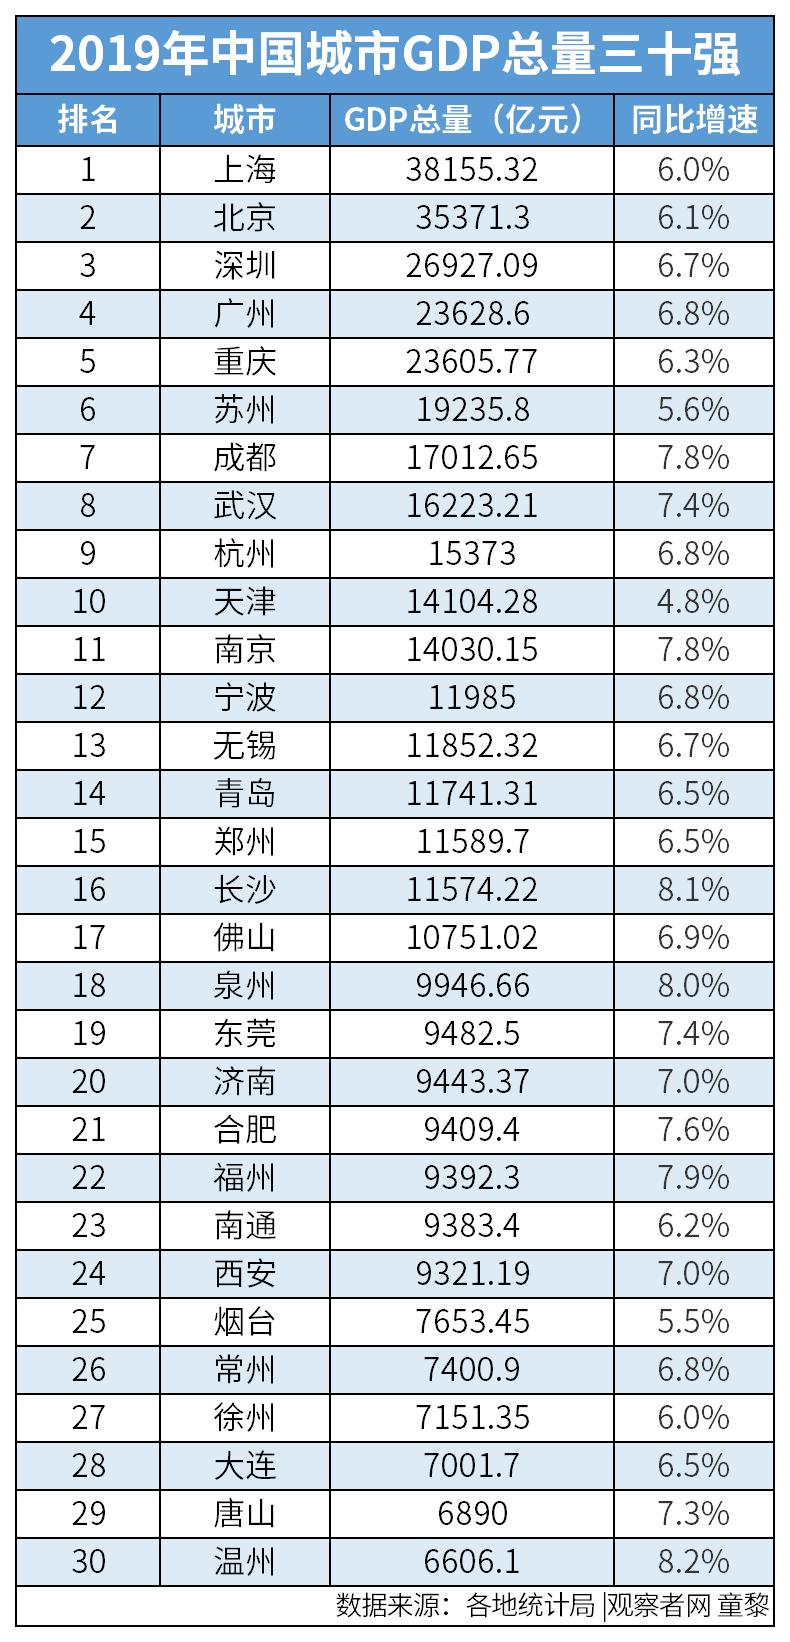 深圳人均gdp_深圳gdp